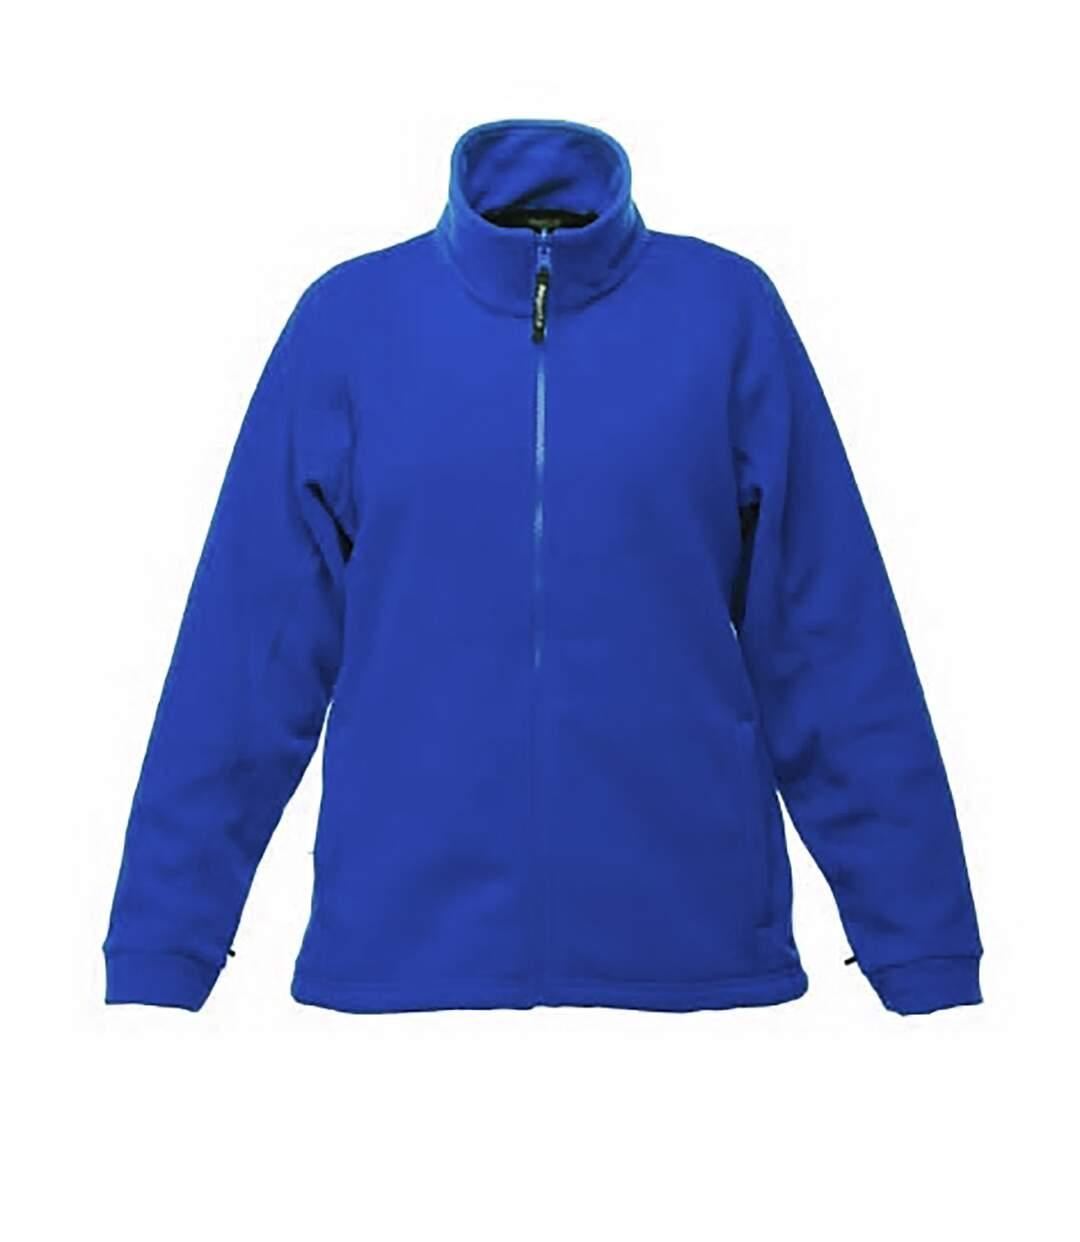 Regatta Mens Thor III Fleece Jacket (Deep Royal Blue) - UTRG1486